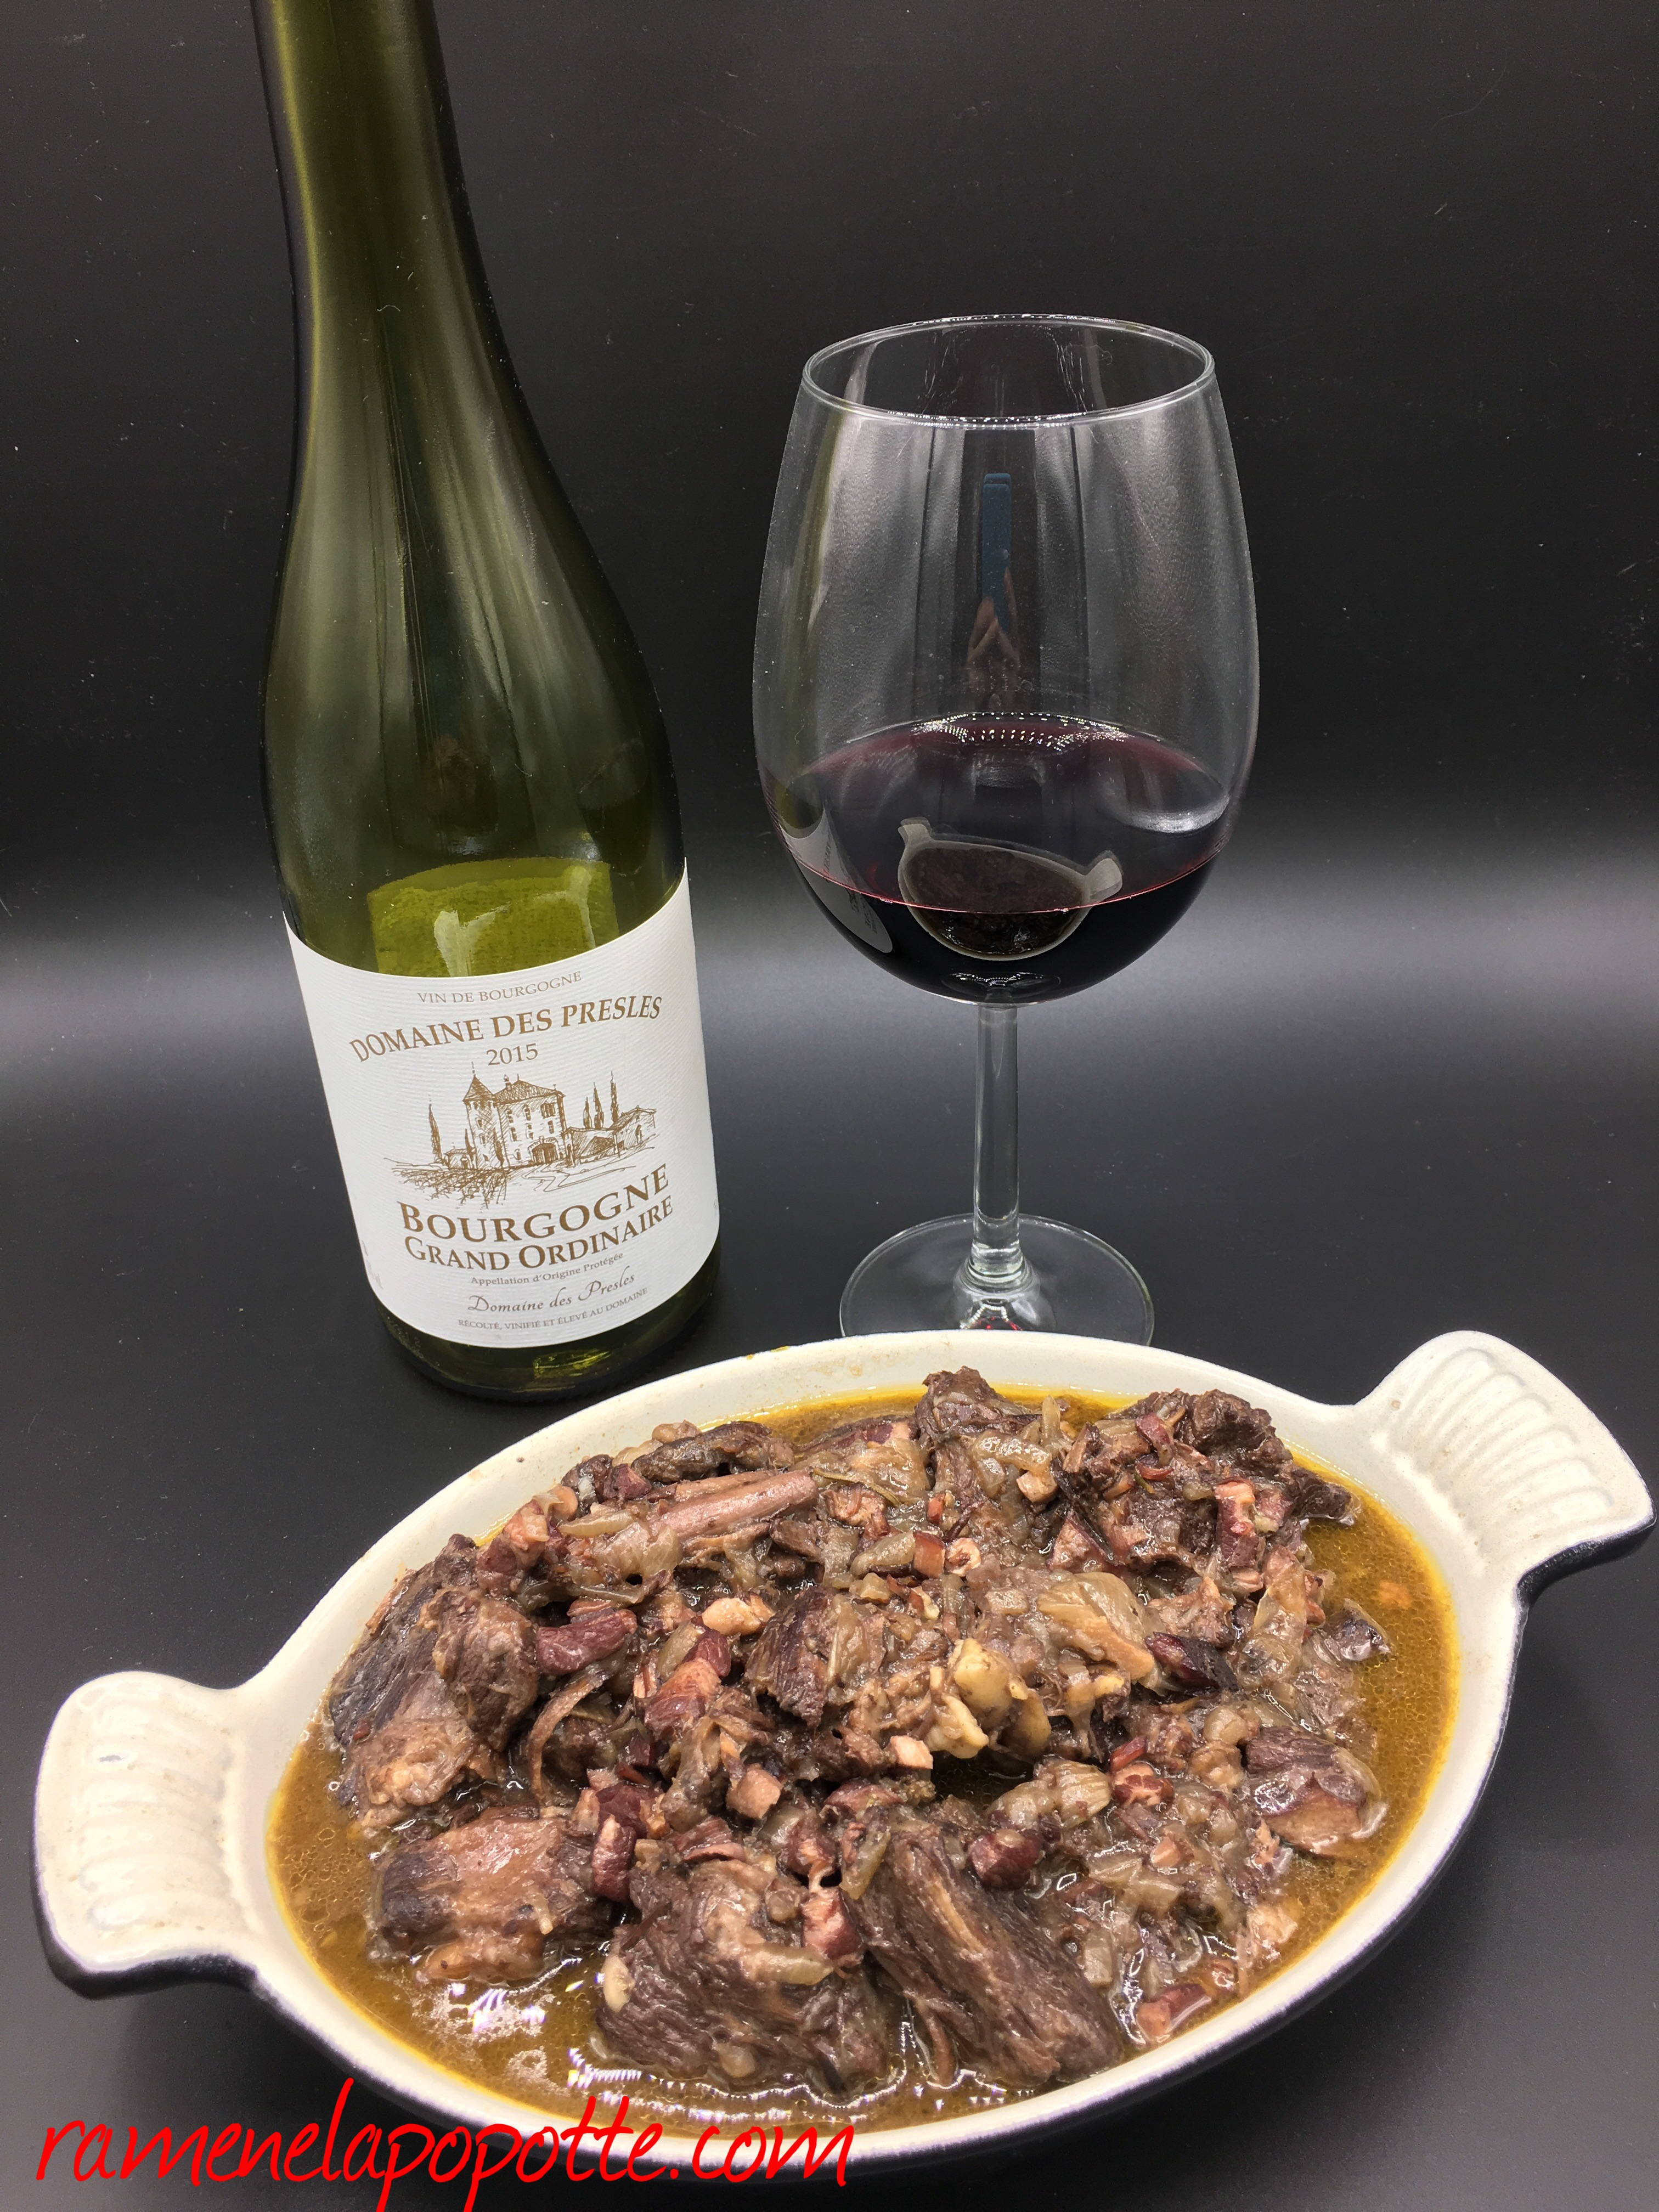 Vin pour boeuf bourguignon elegant g de boeuf pour - Quel vin pour cuisiner un boeuf bourguignon ...